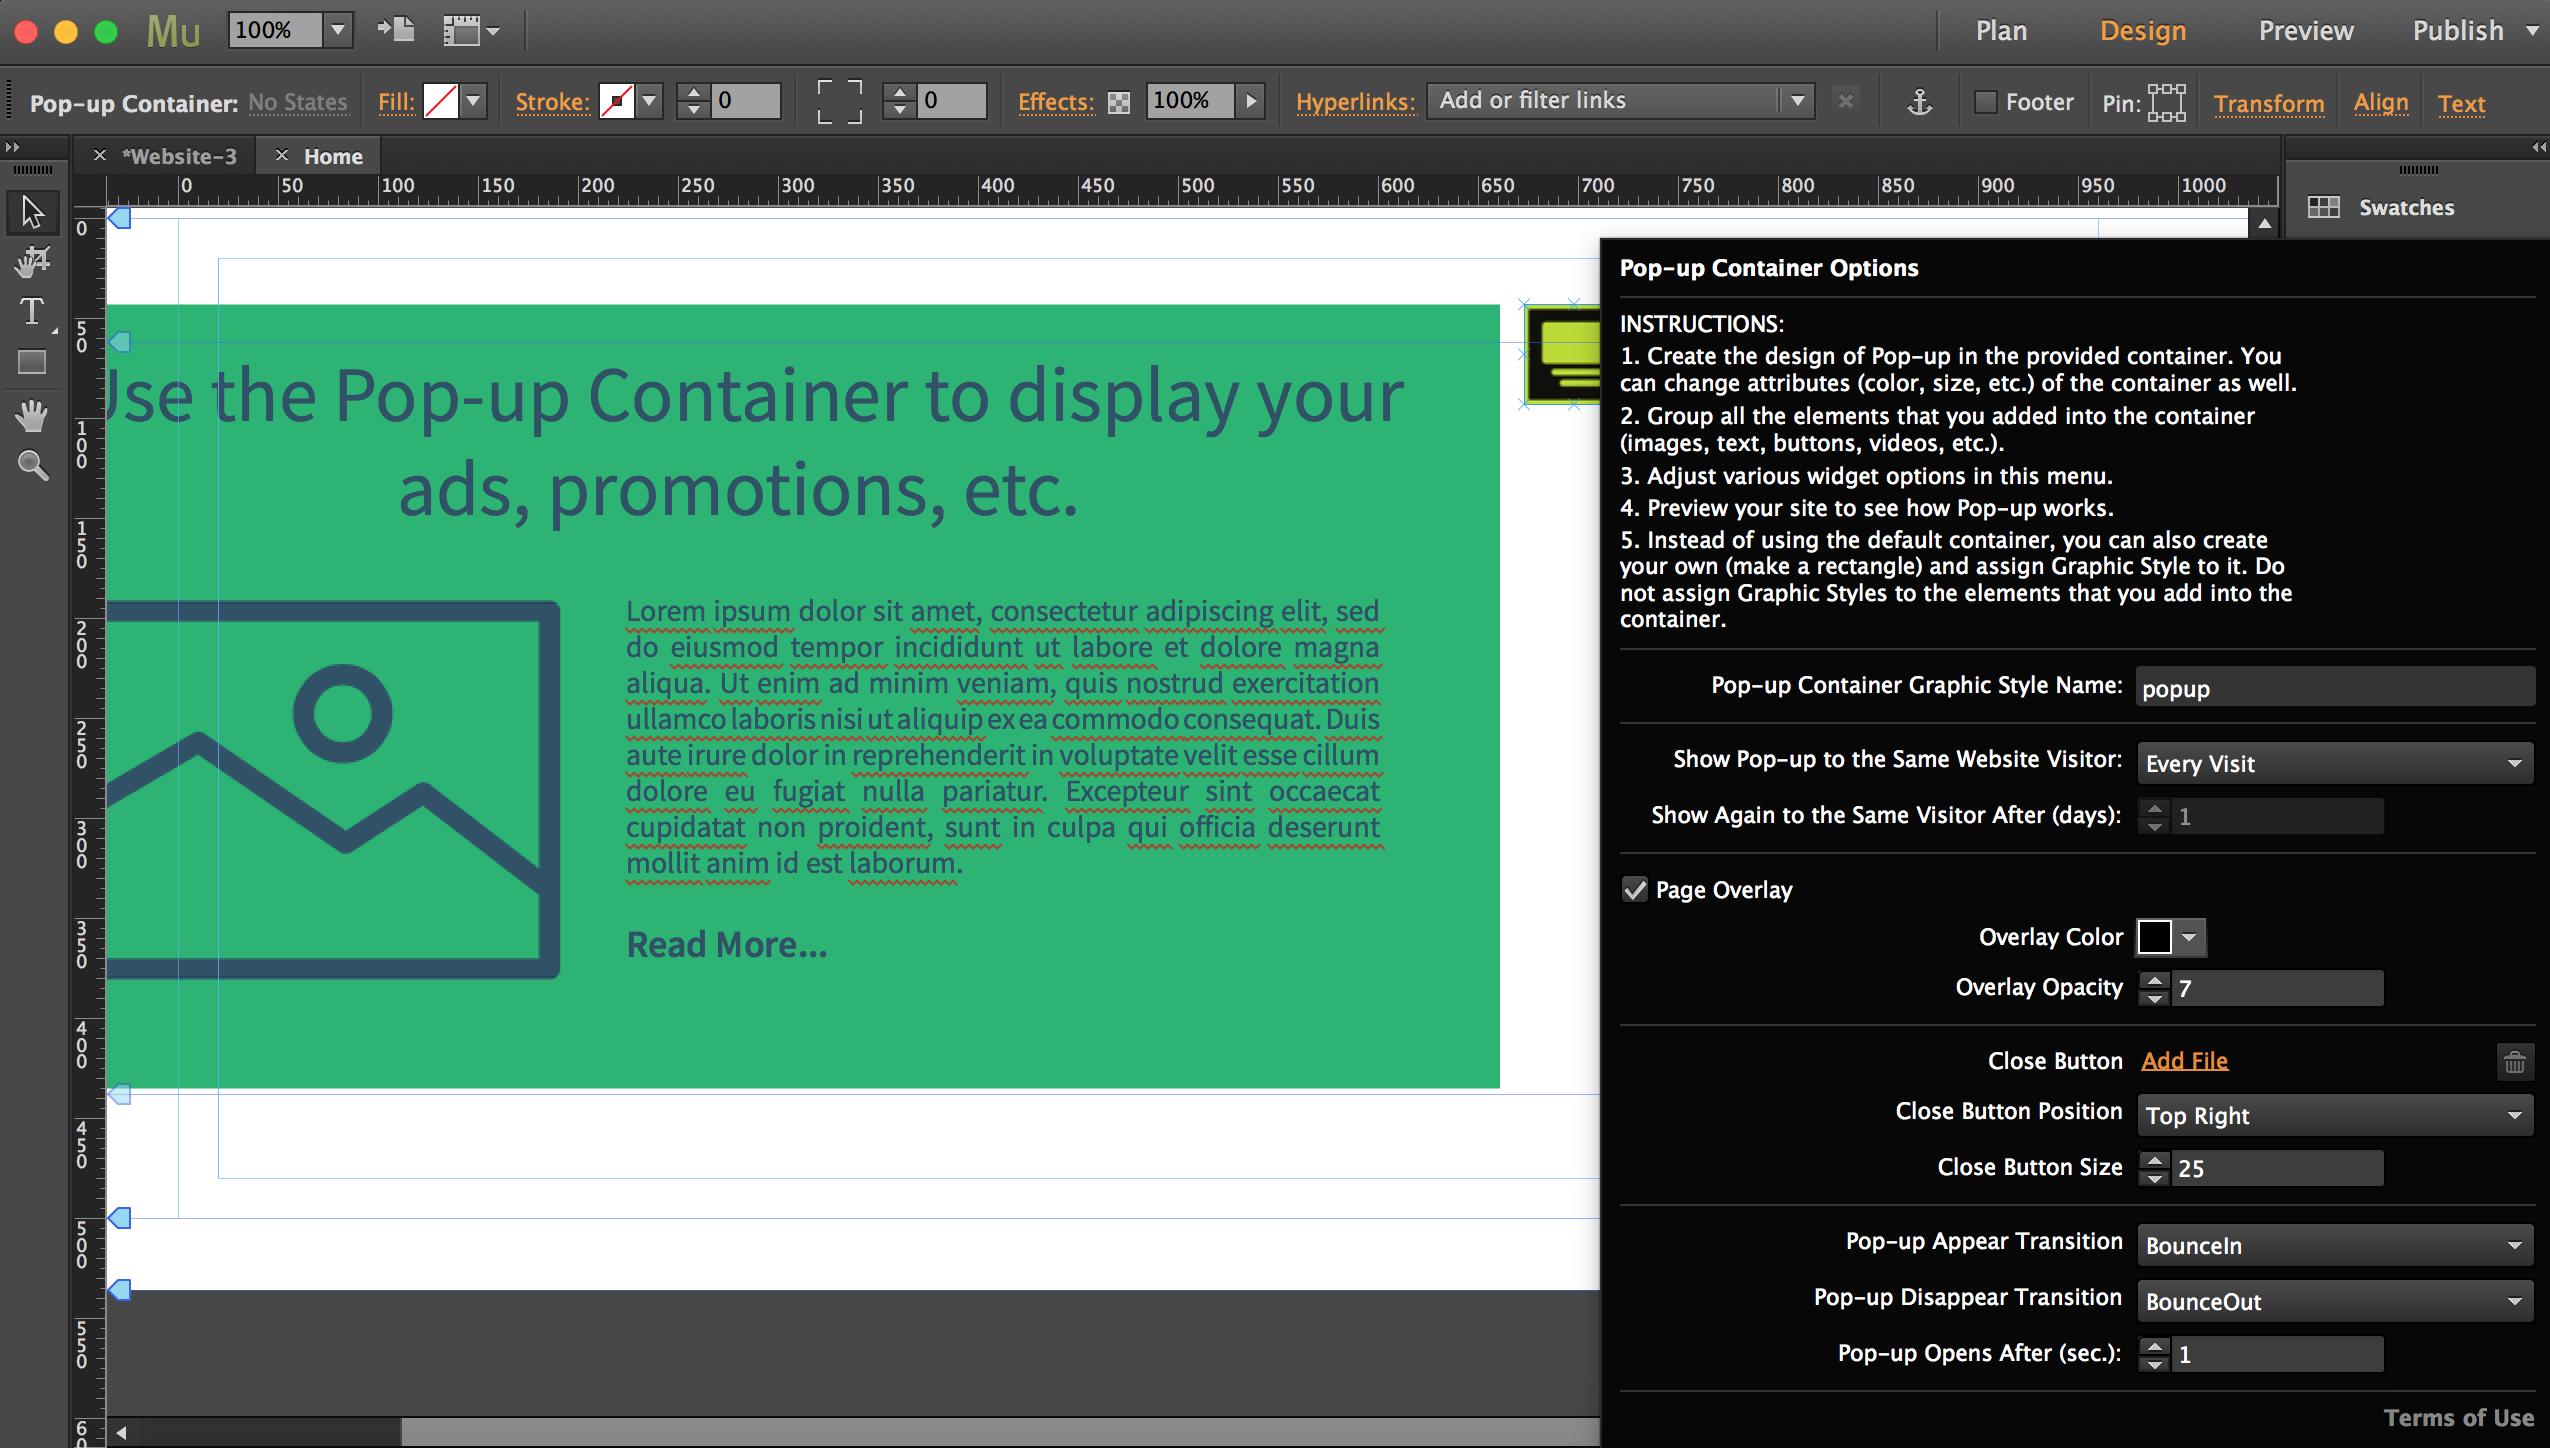 Pop-up Container Adobe Muse Widget